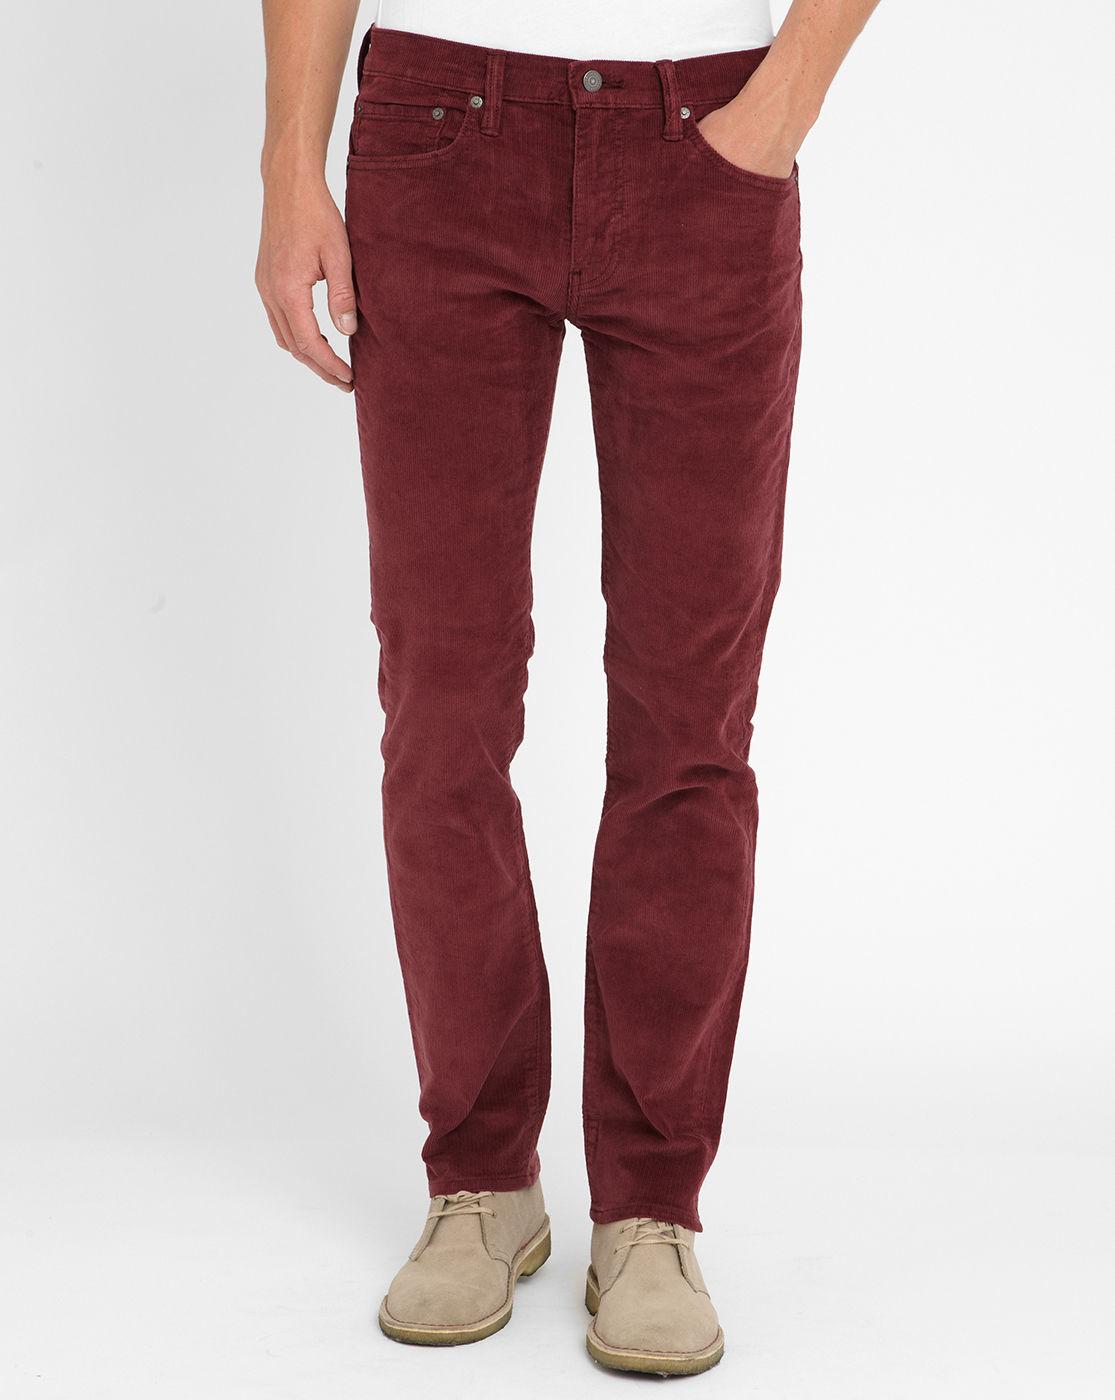 Mens Burgundy Jeans